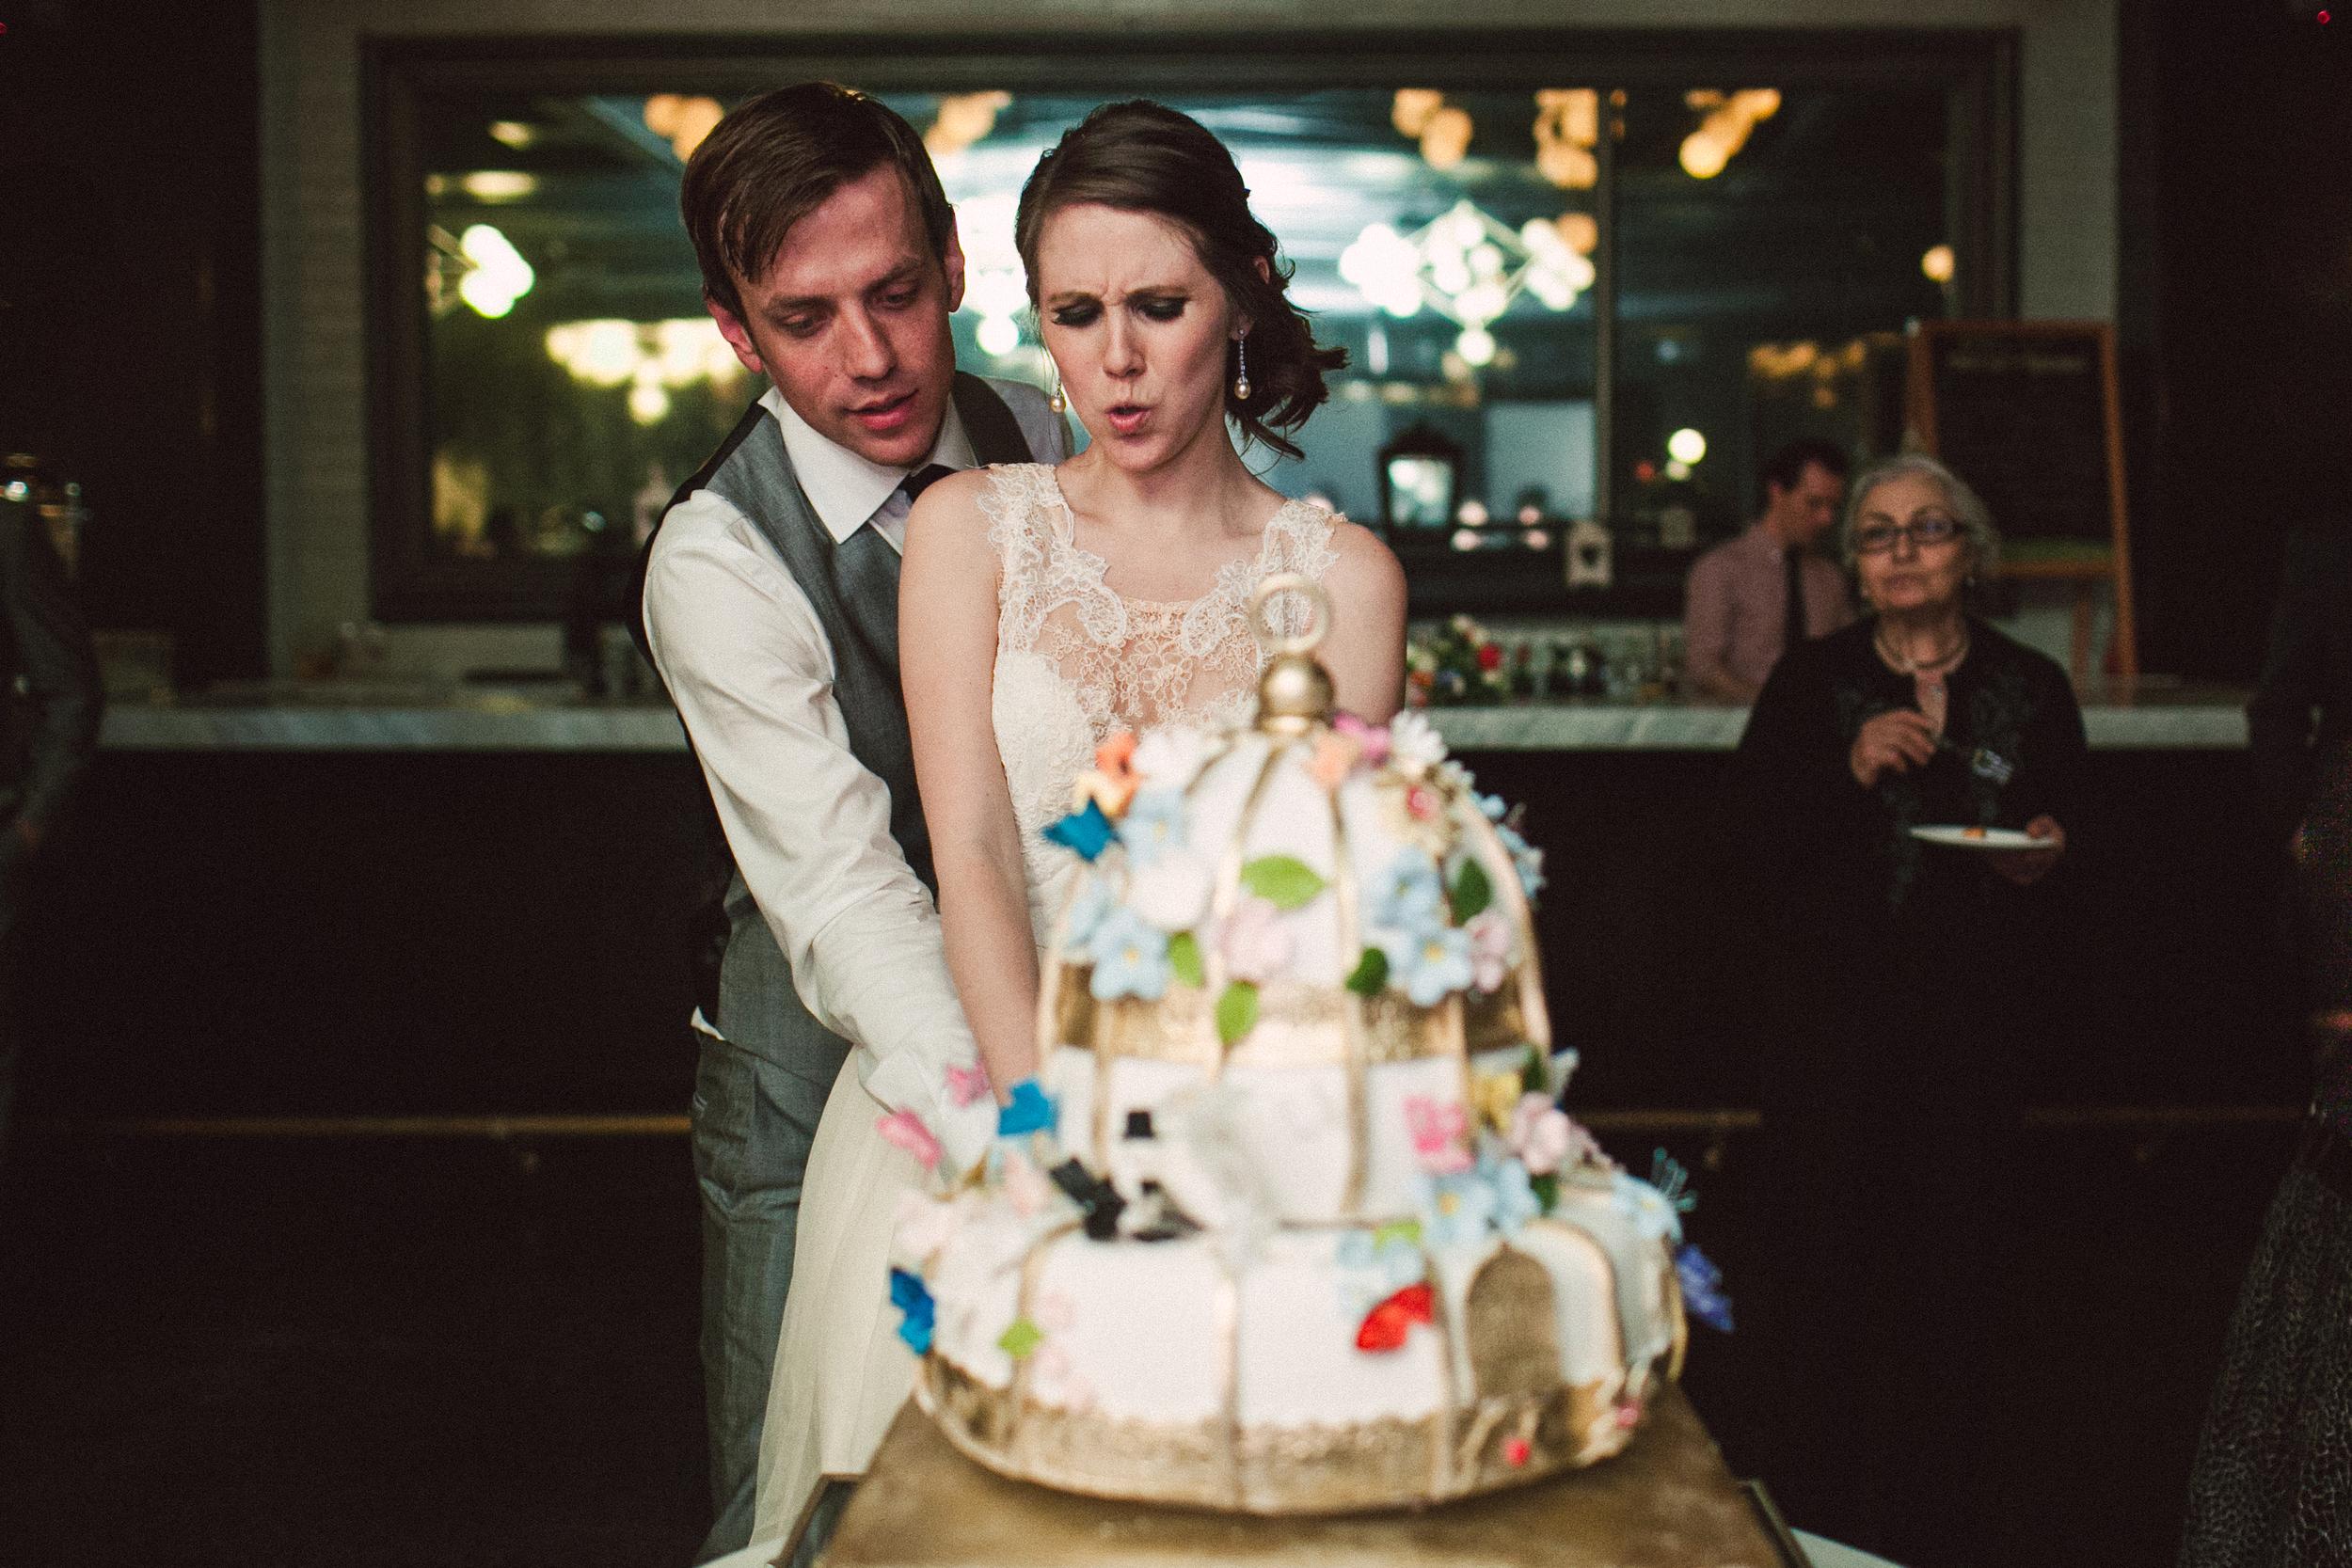 501-union-brooklyn-wedding-jove-meyer-events-186.jpg